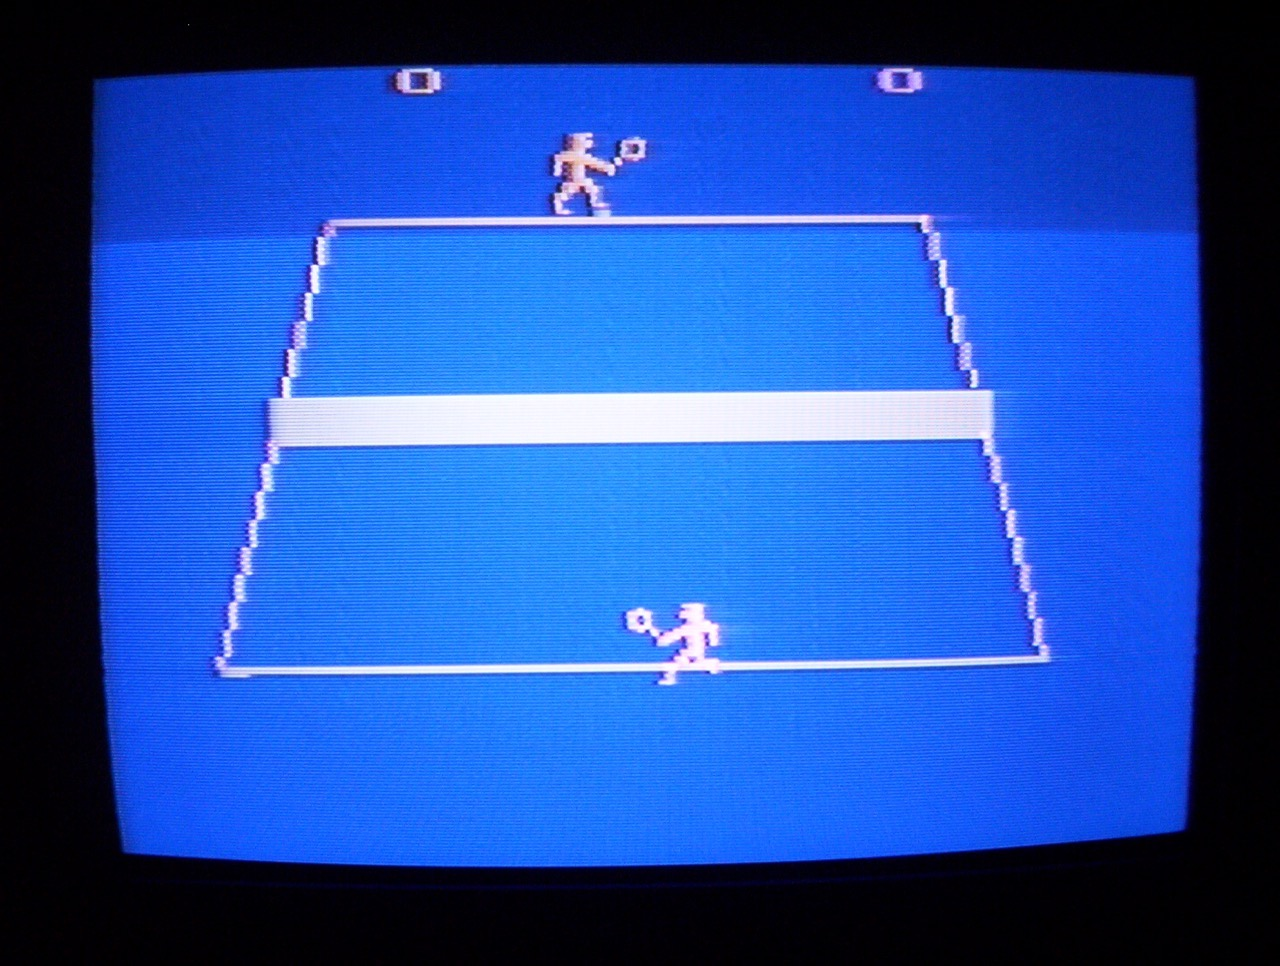 Activision Tennis ohne Activision Logo. (Bild: André Eymann)